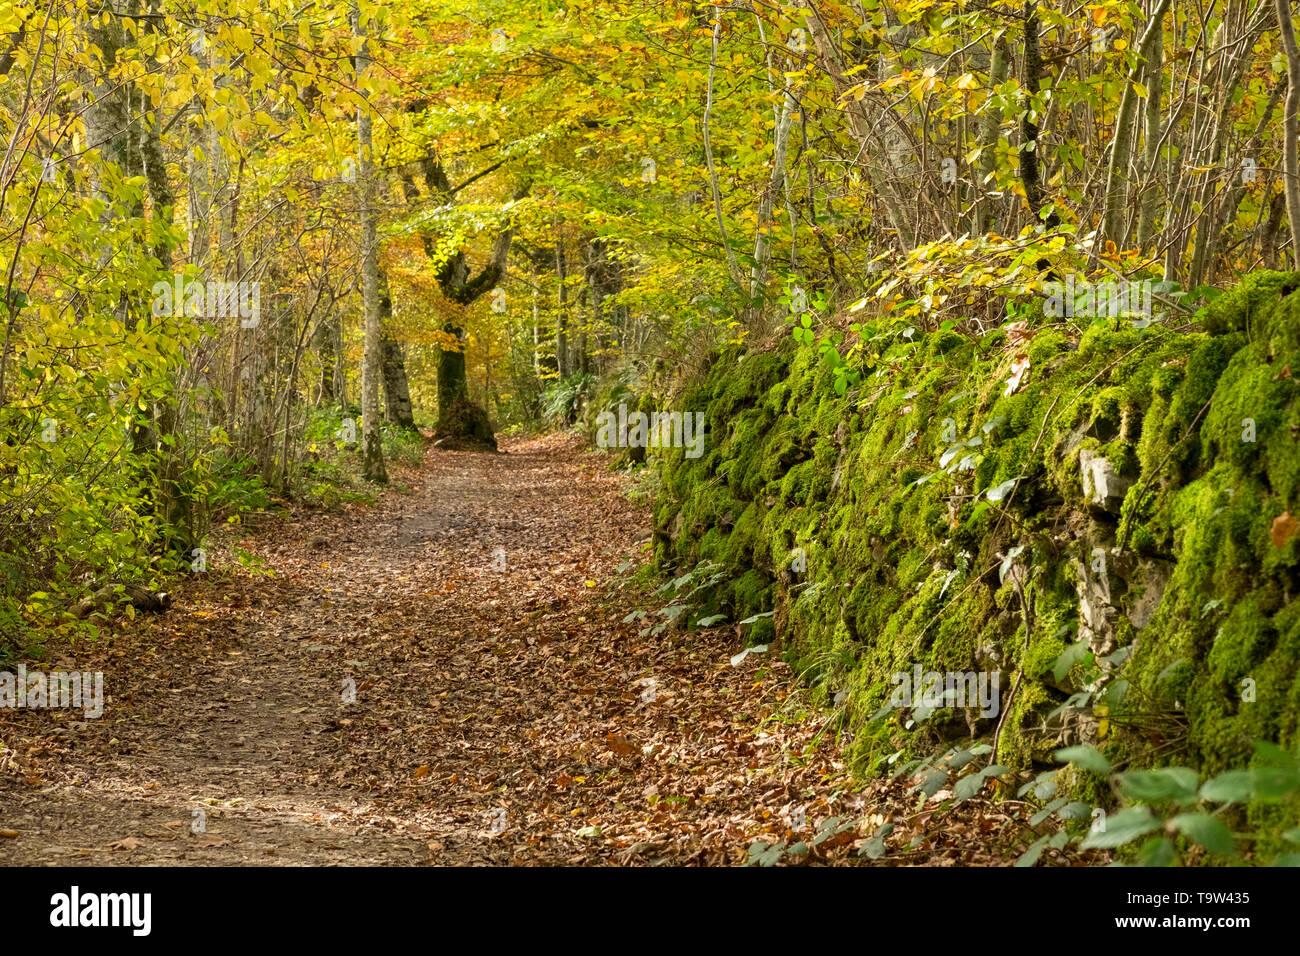 Roncesvalles in Autumn, Navarre, Spain - Stock Image